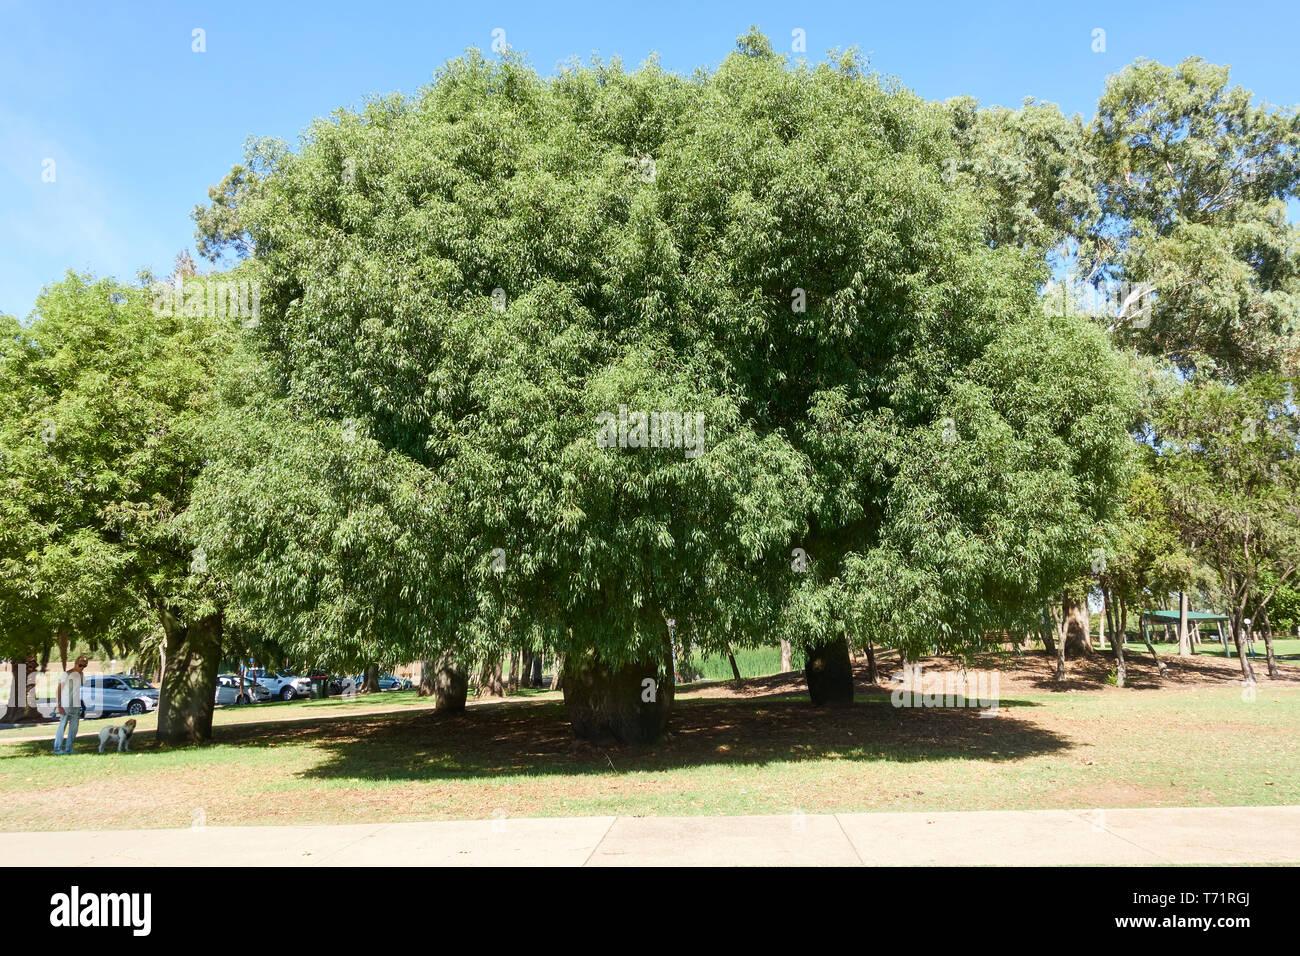 risalente Tamworth NSW